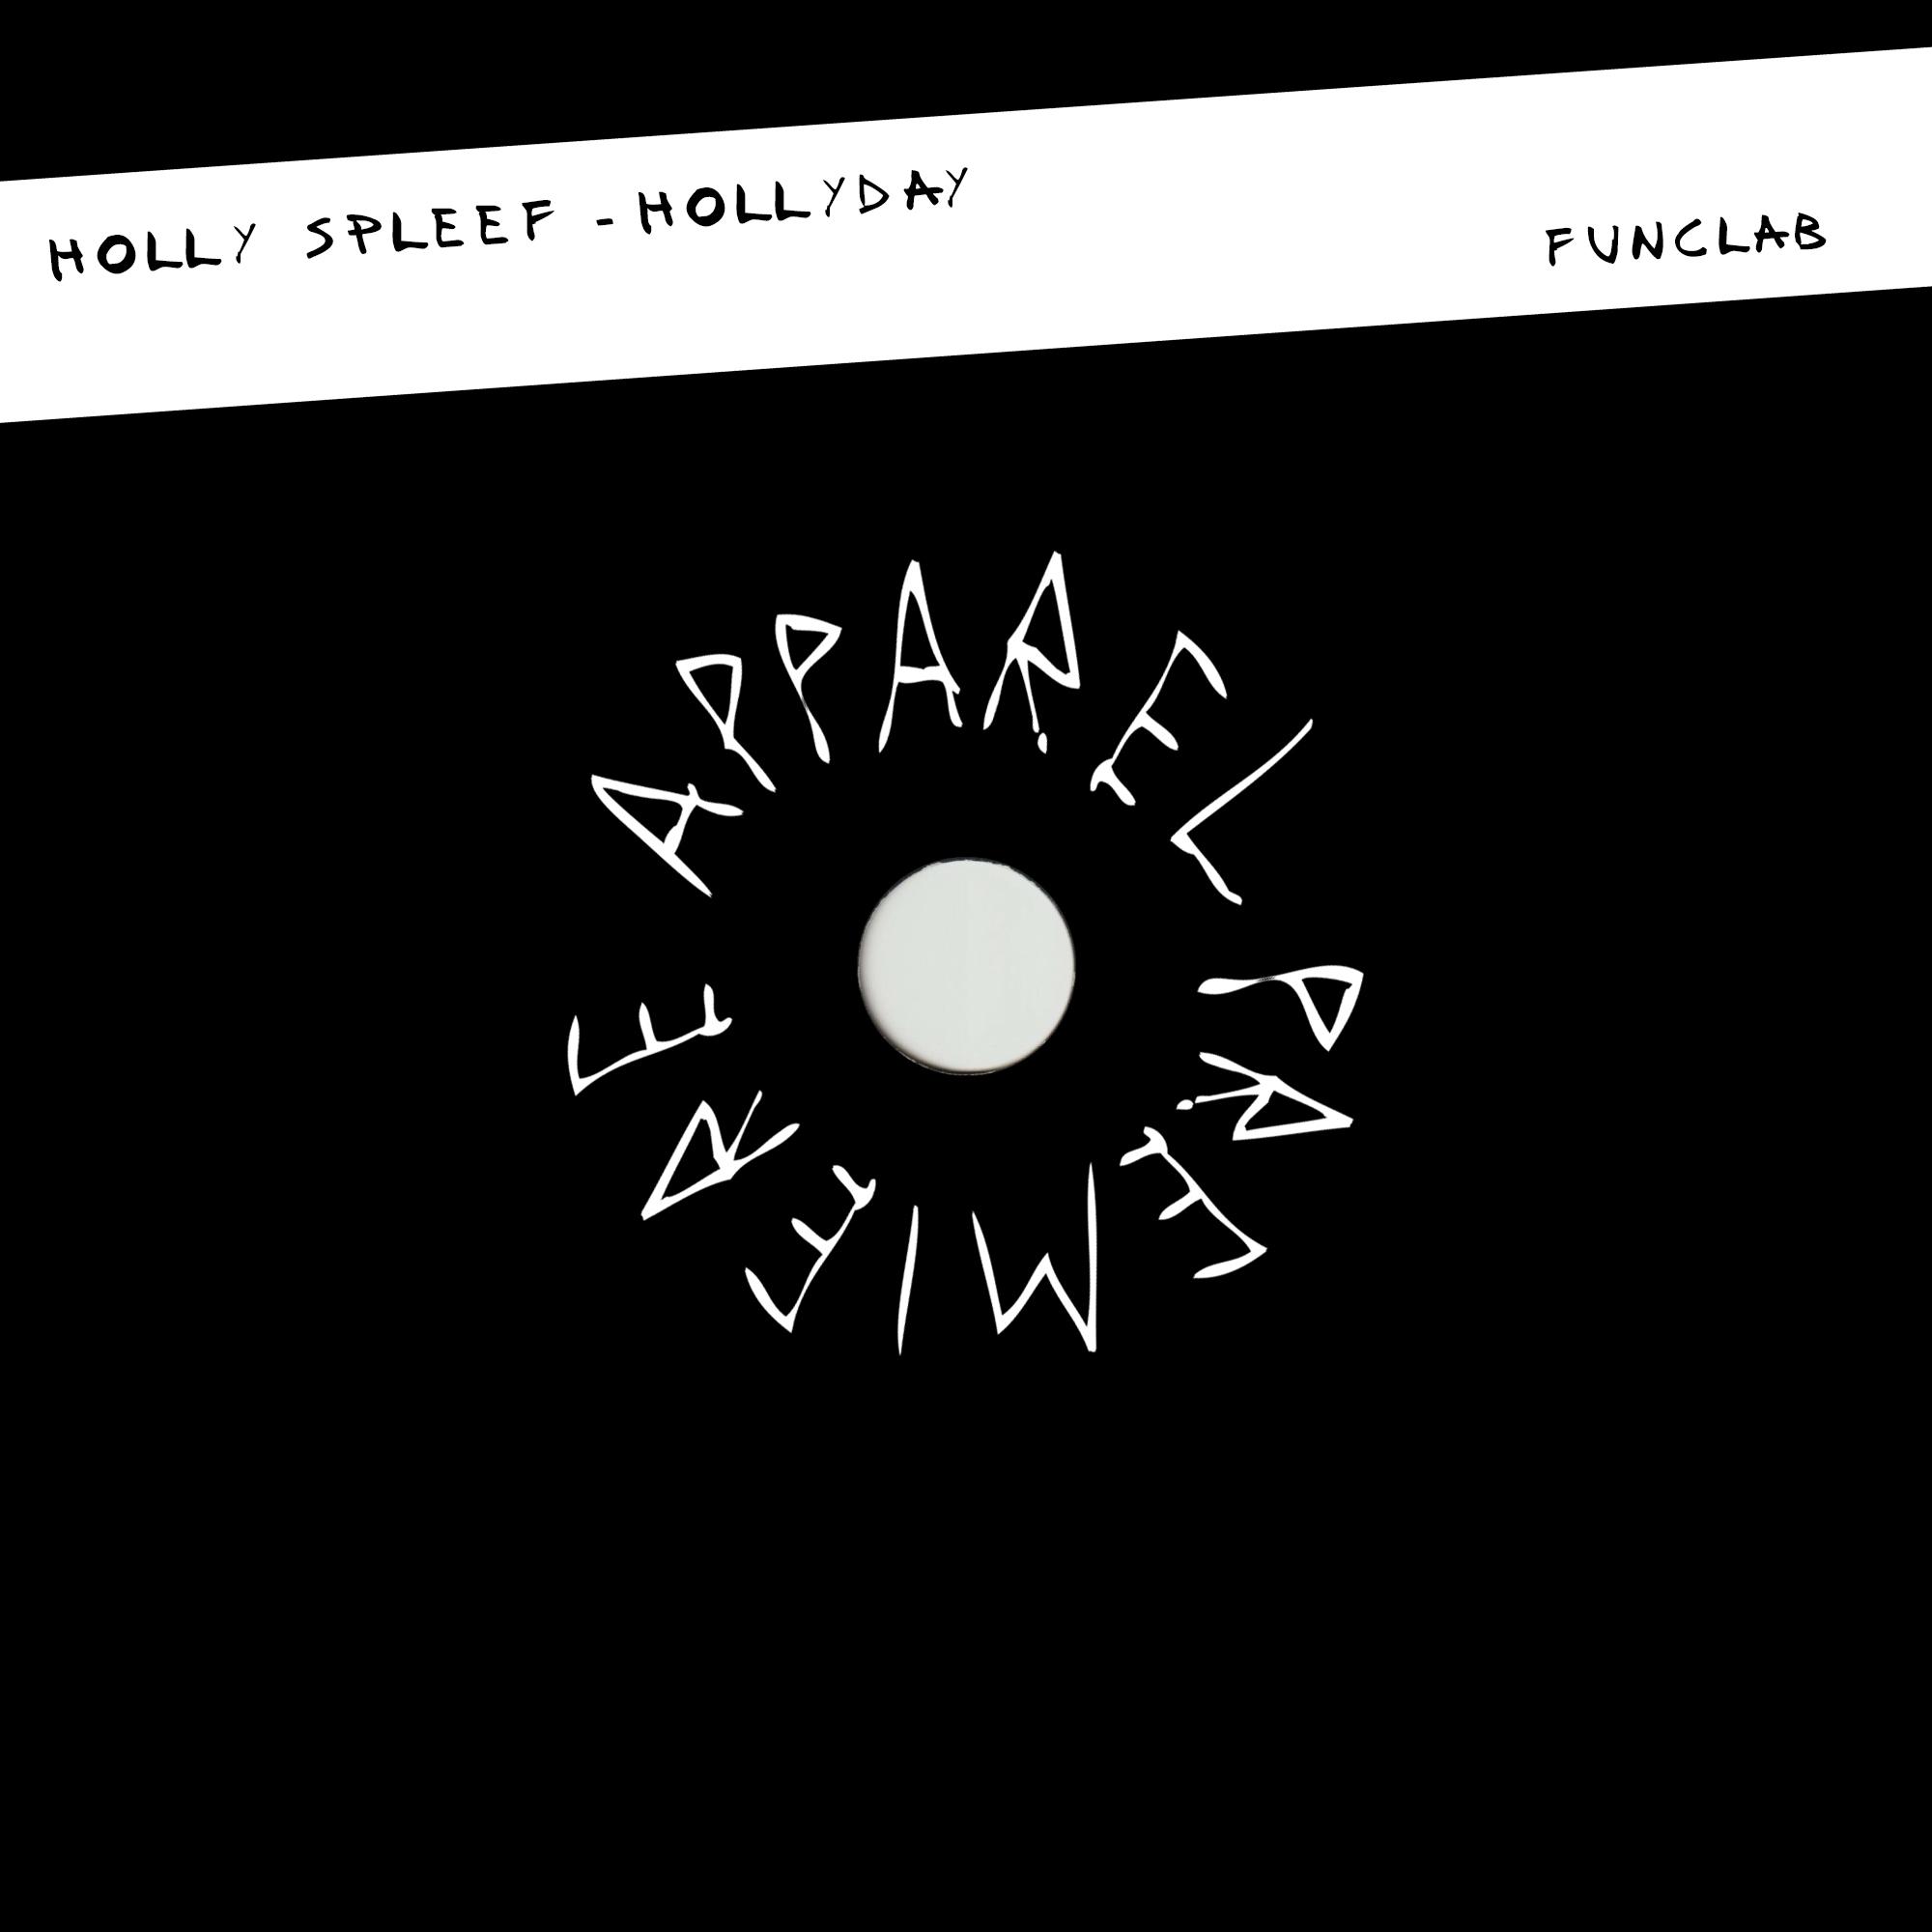 APPAREL PREMIERE Holly Spleef Hollyday [Funclab] Artwork